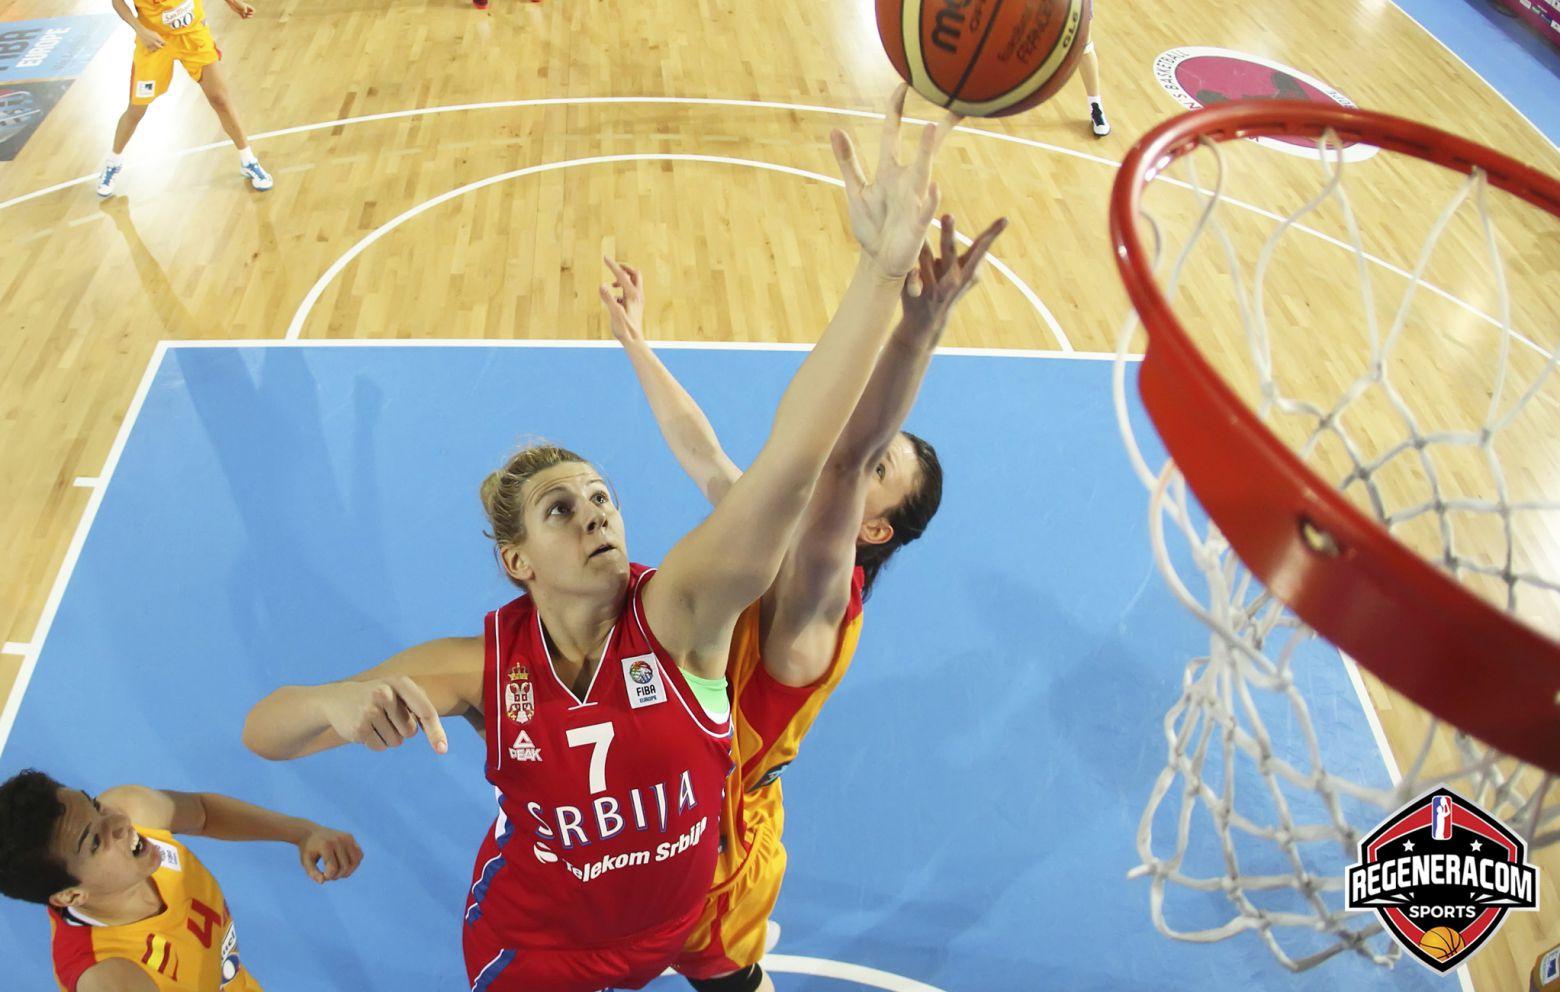 SARA KRNJIC has signed with Regeneracom Sports